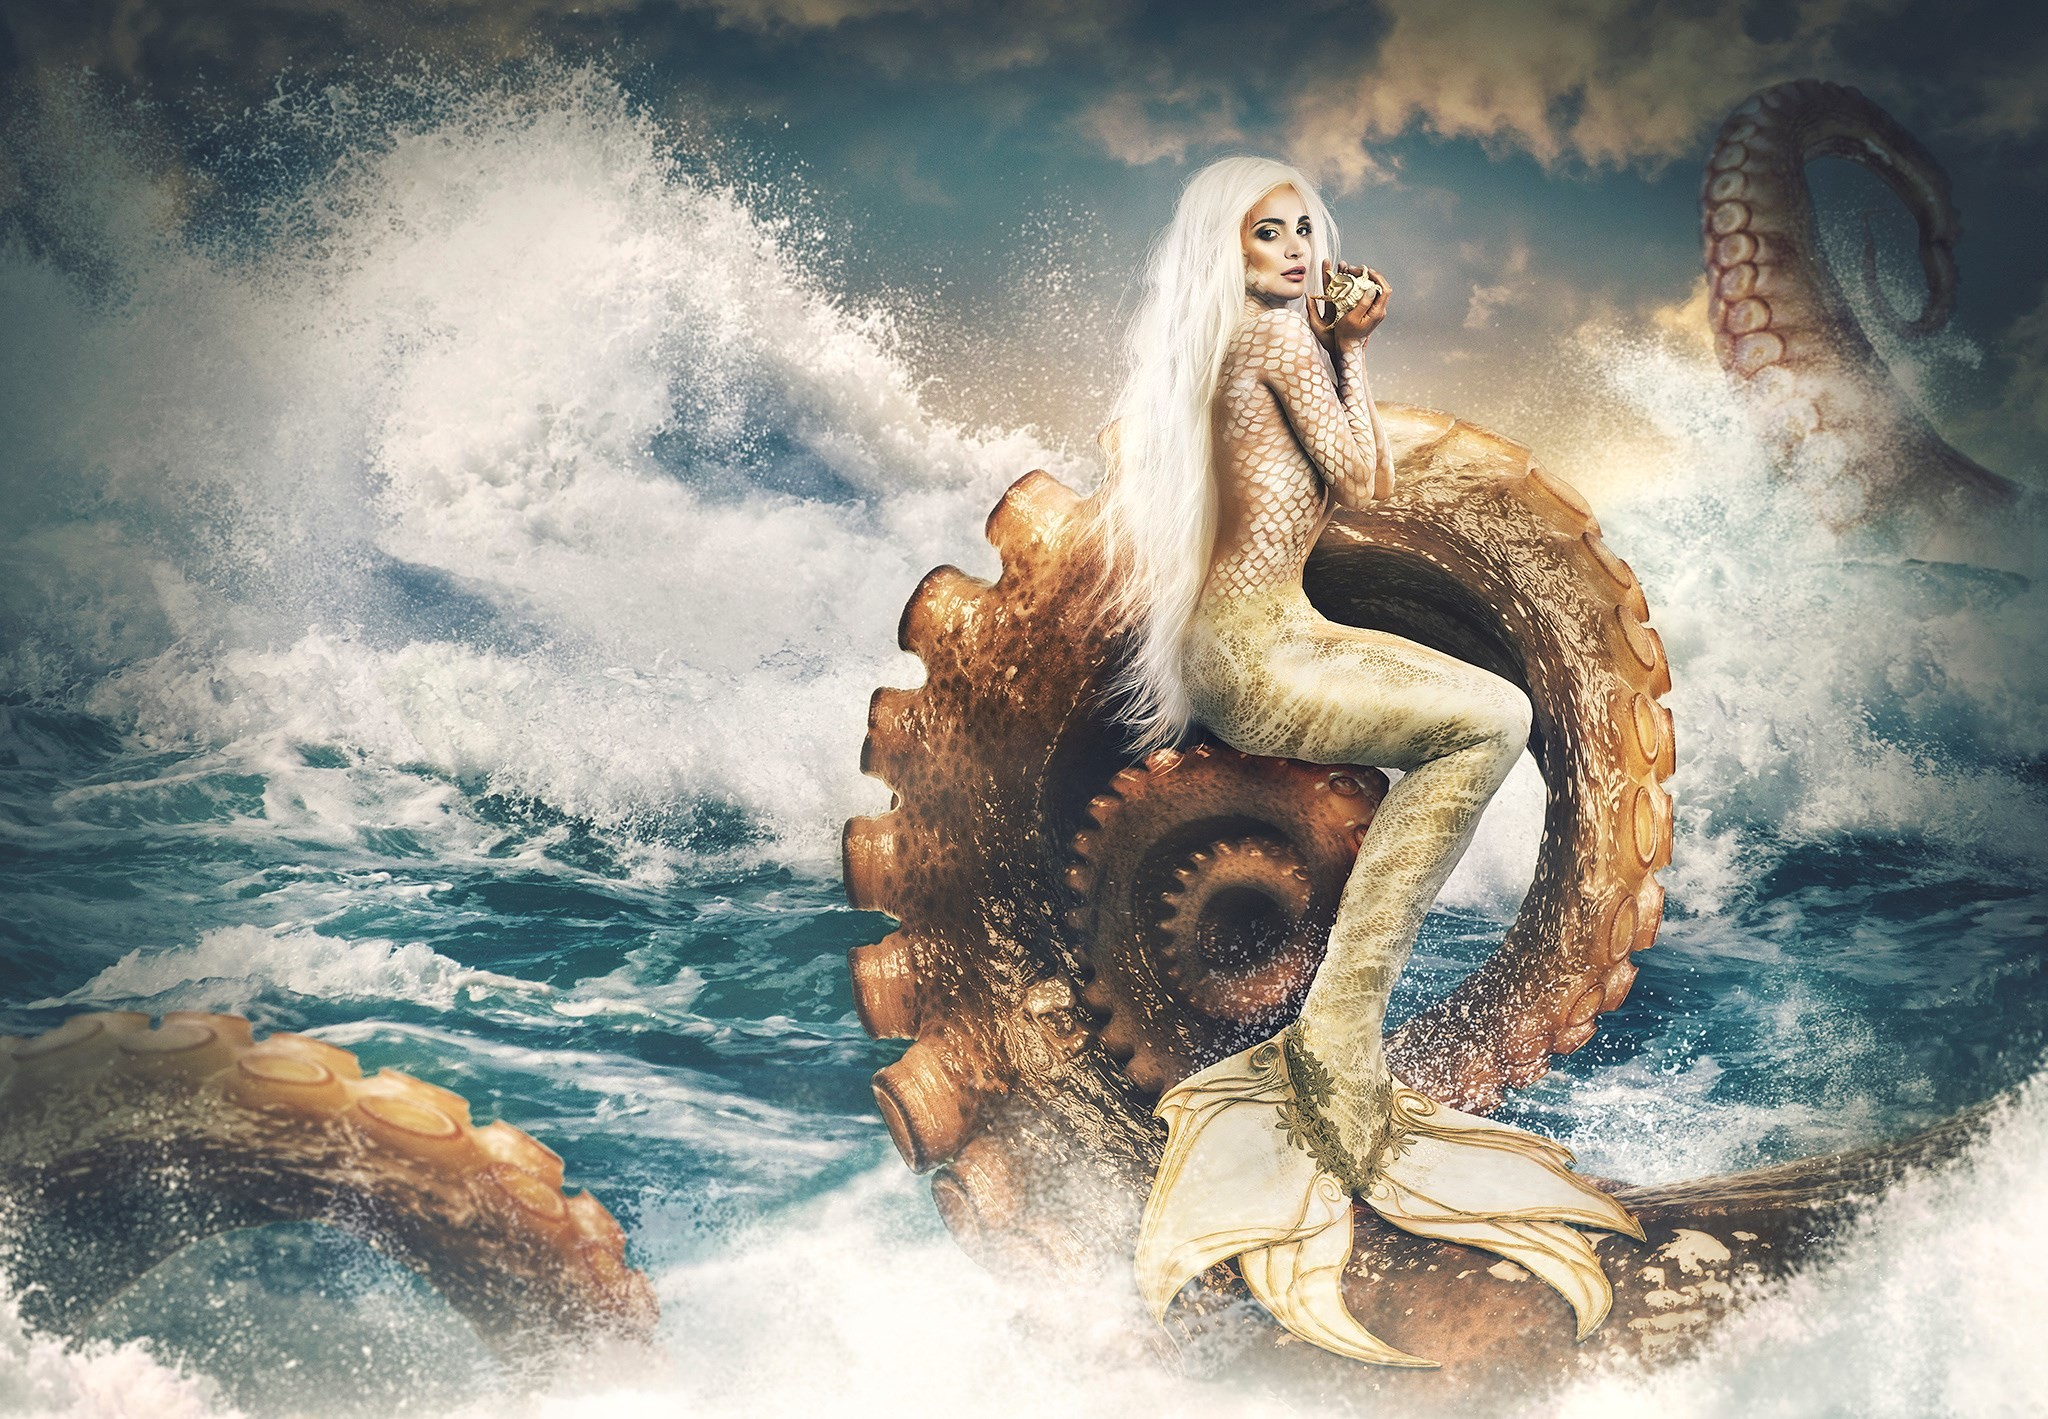 free computer wallpaper for mermaid